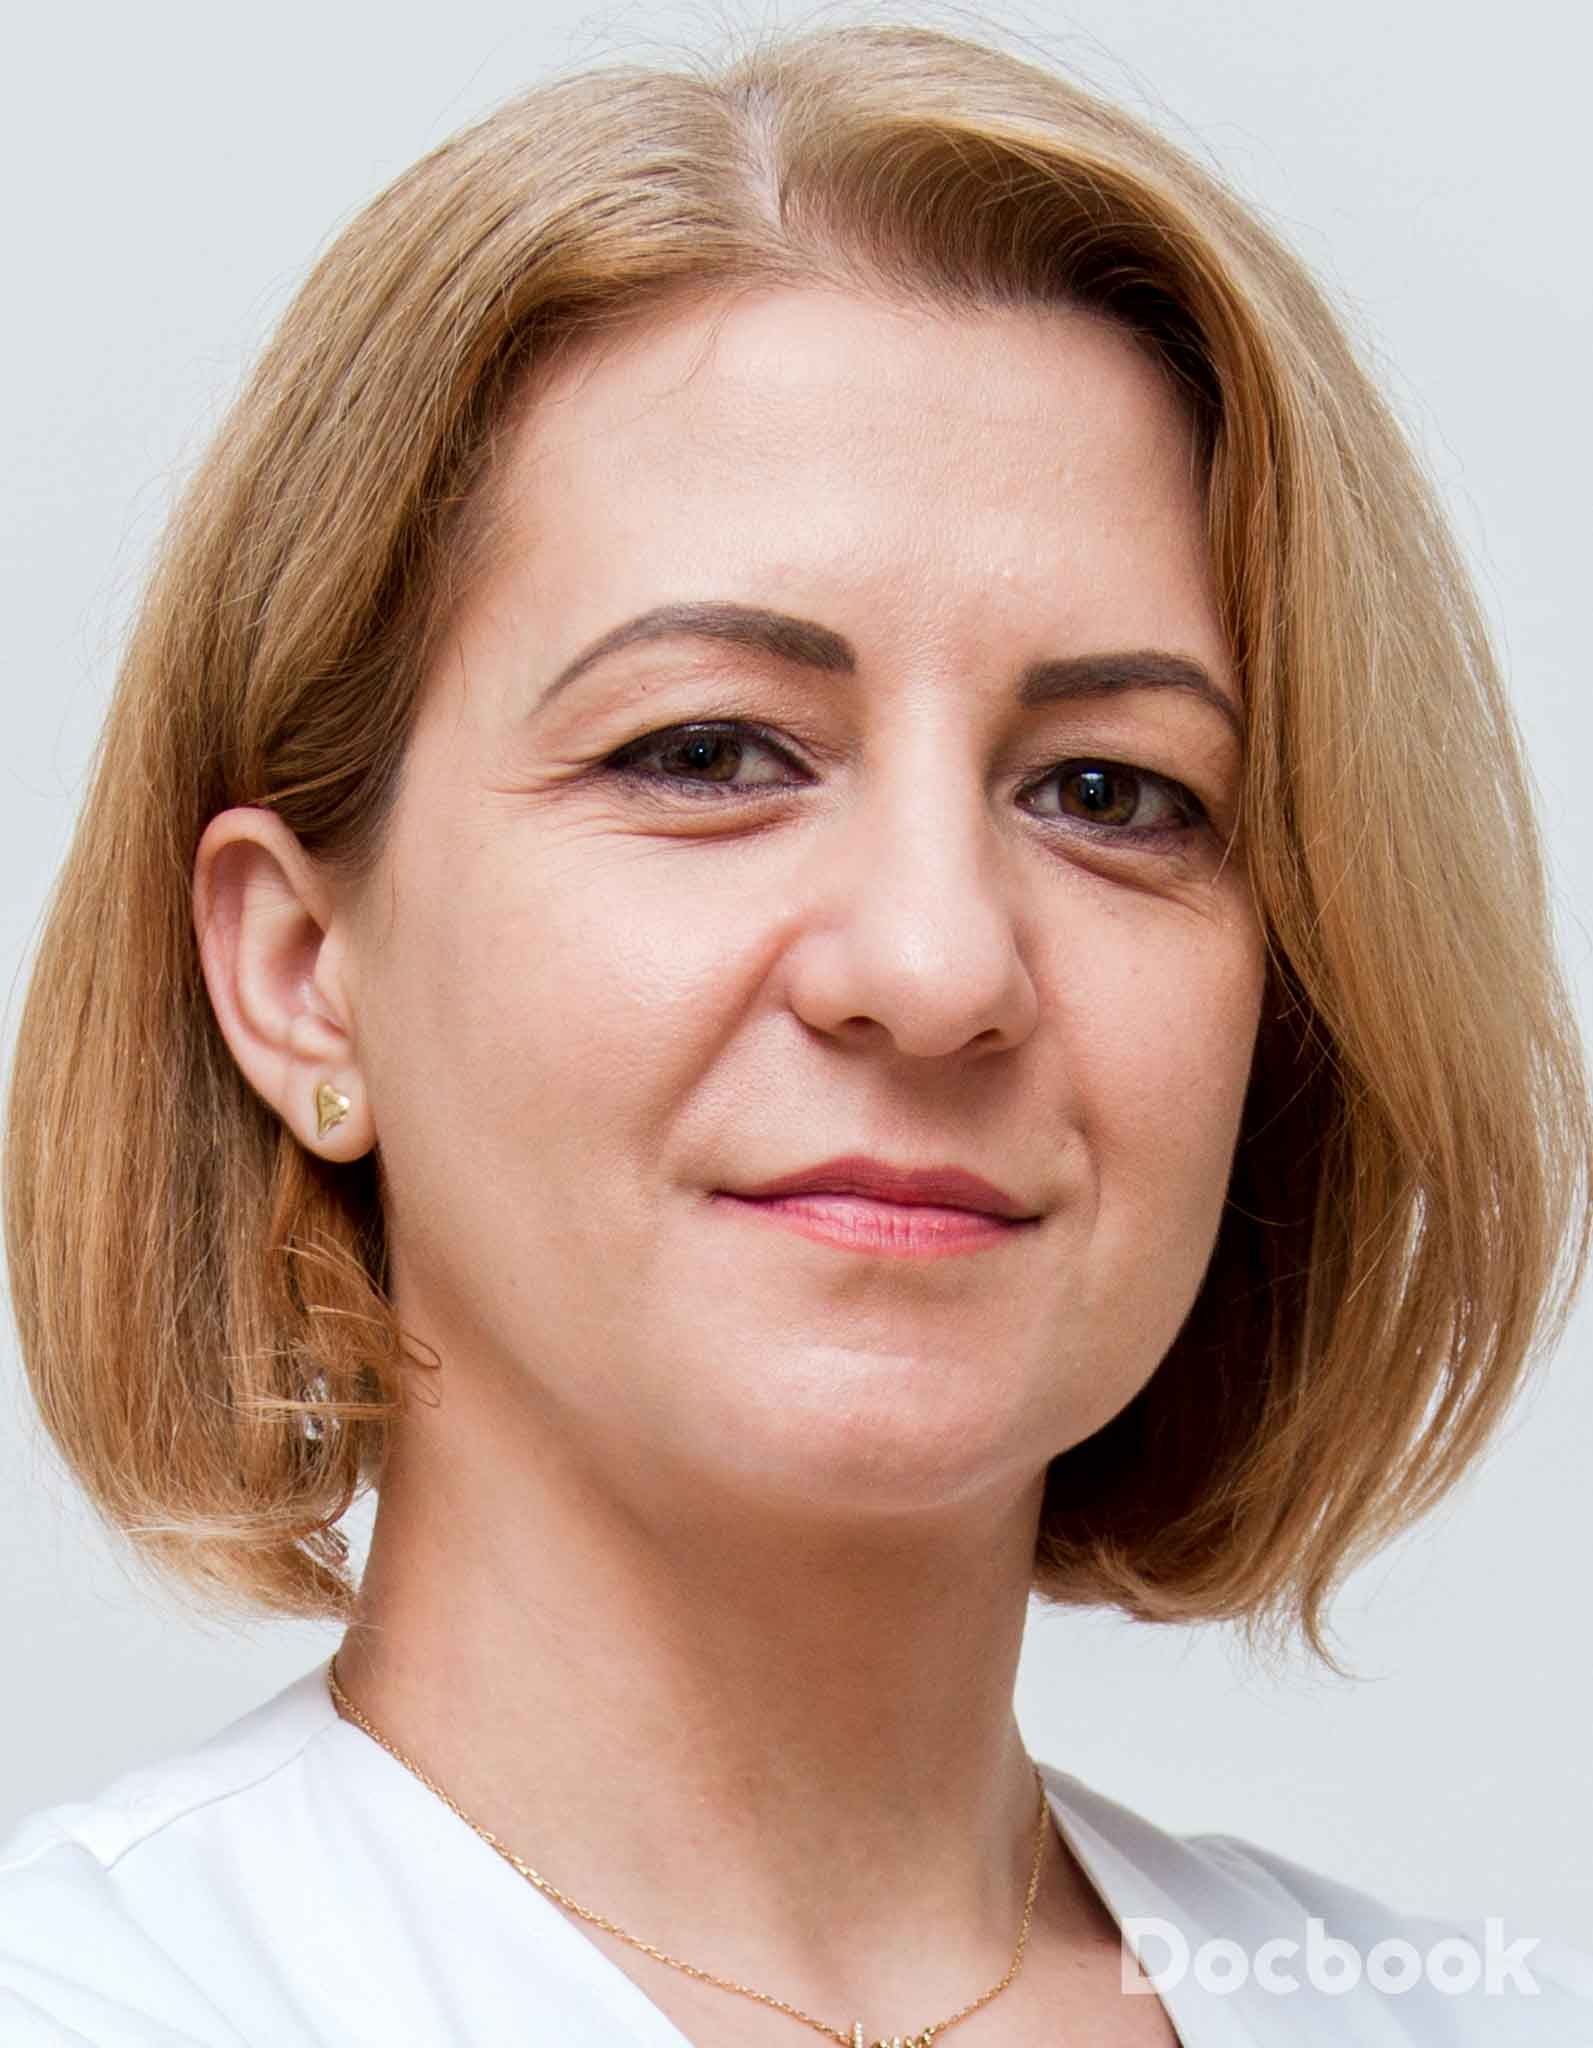 Dr. Iolanda Neagu